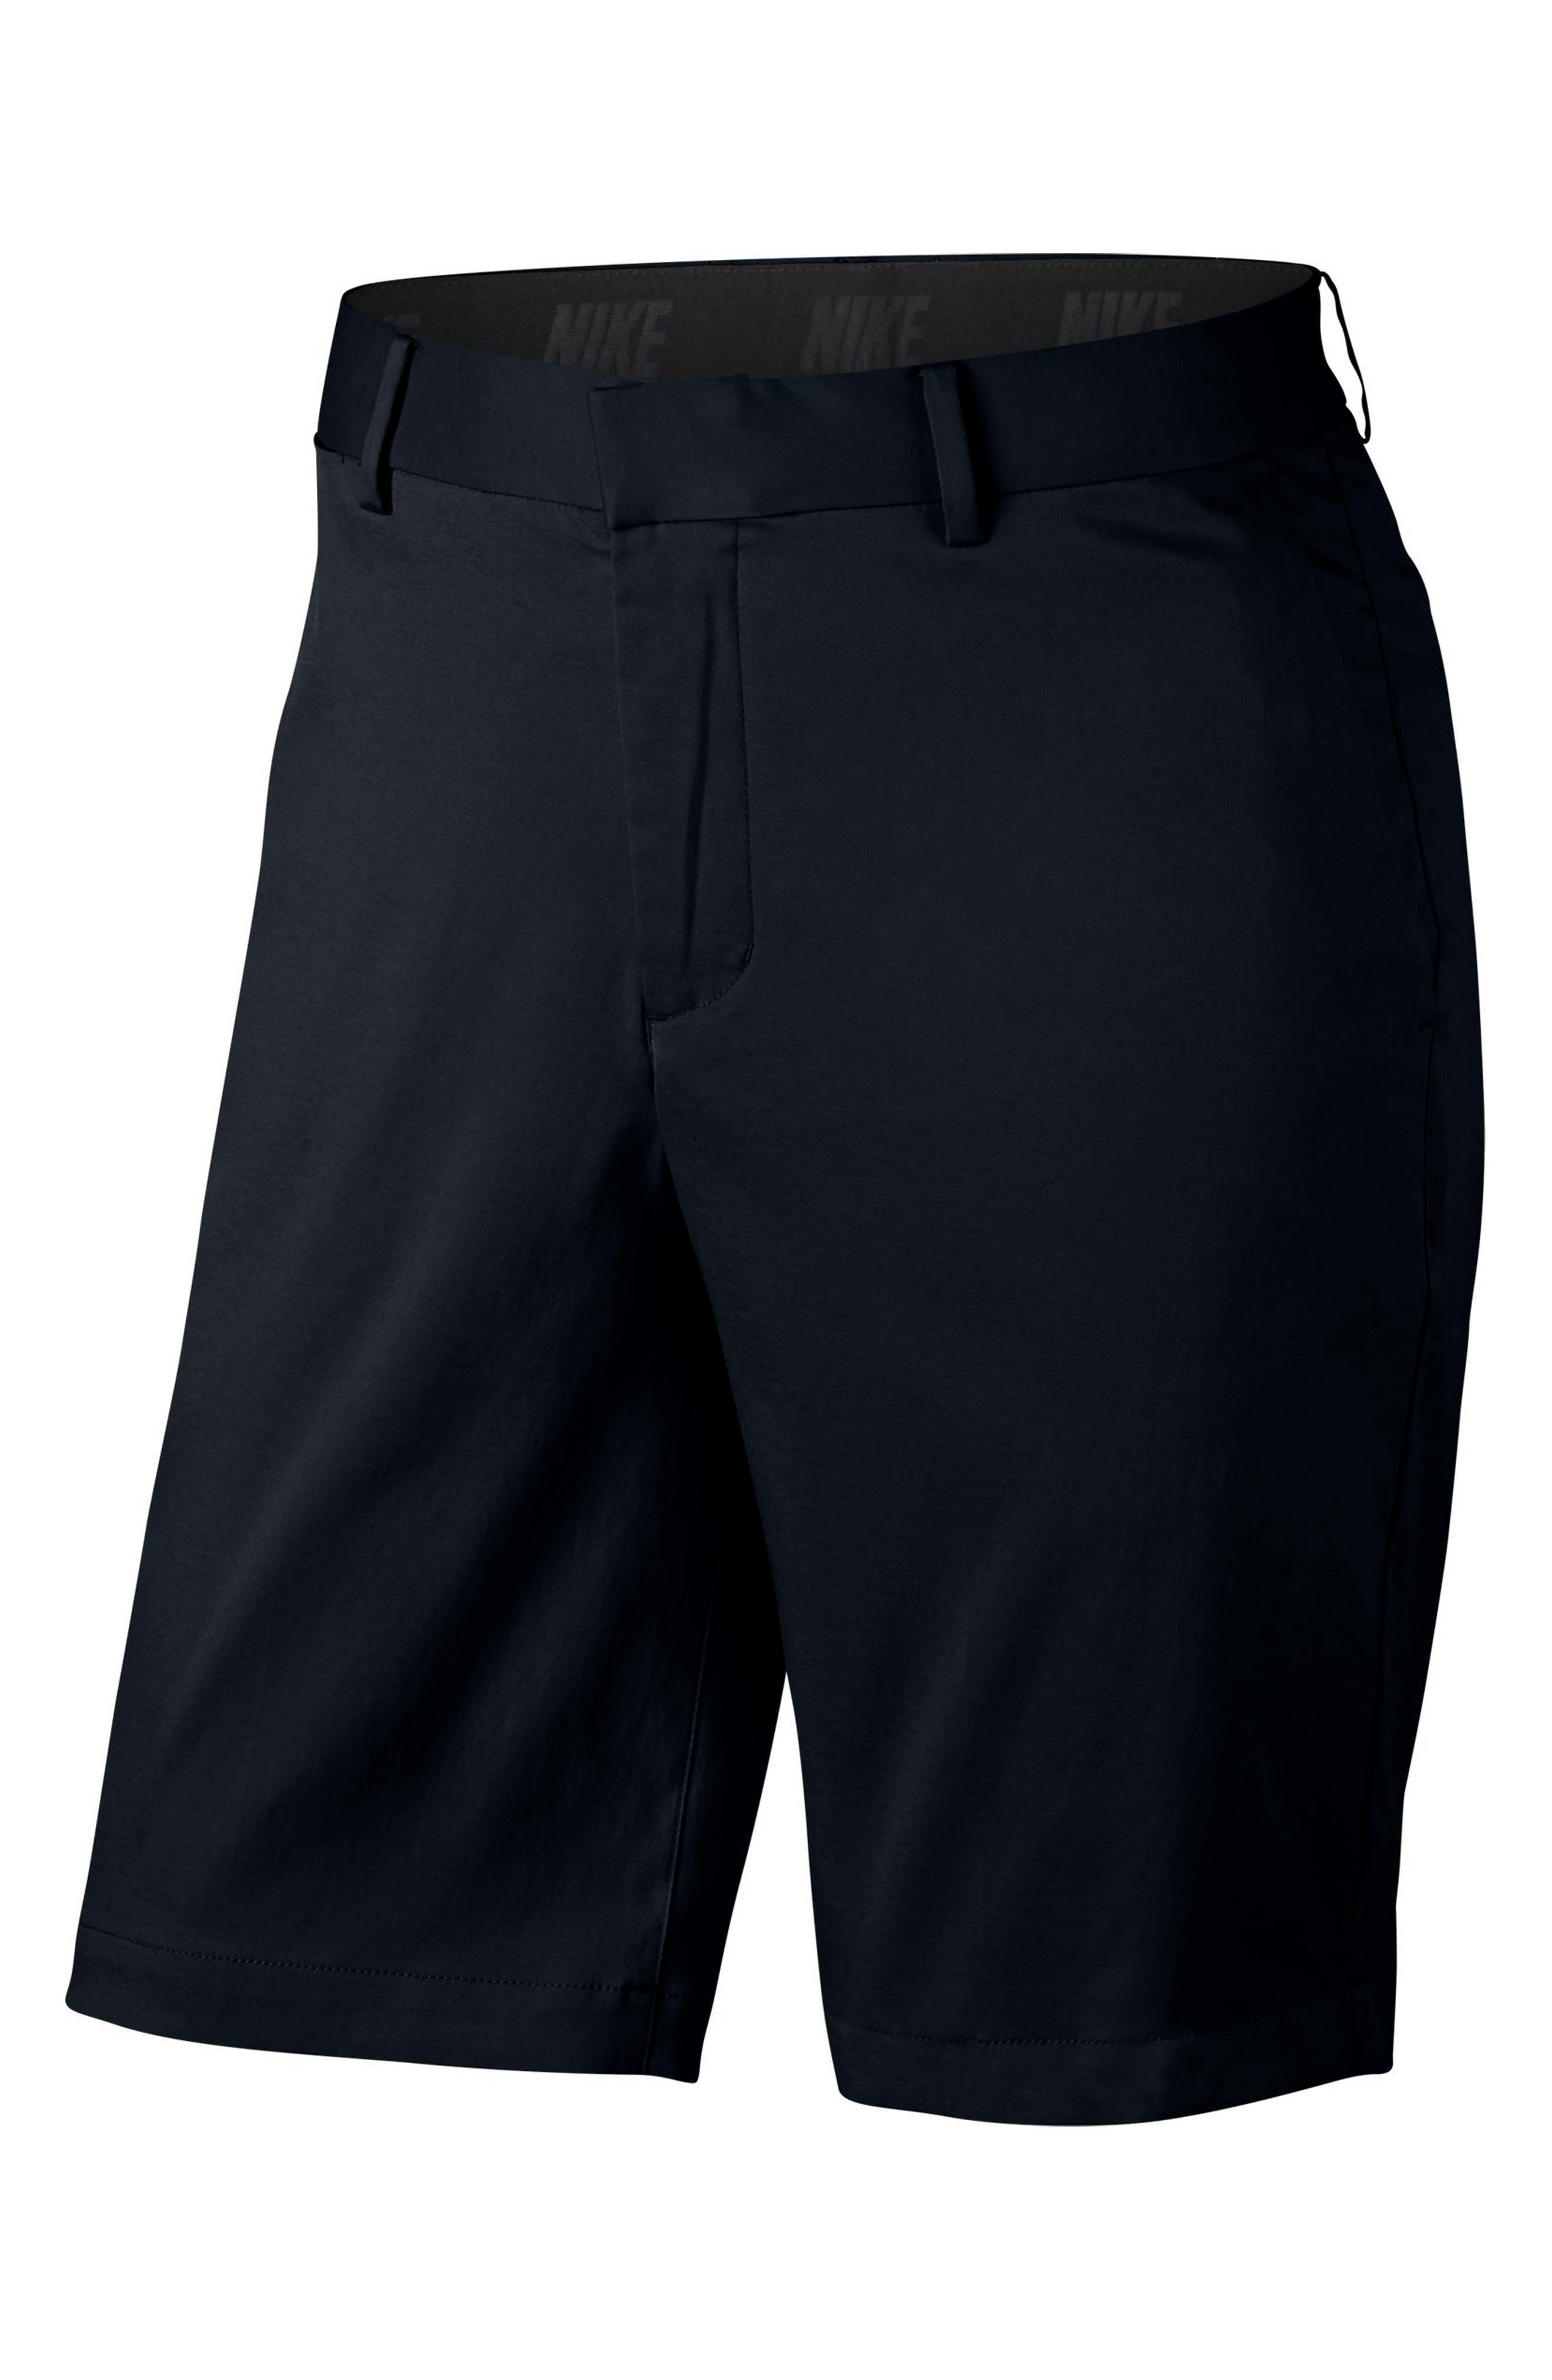 Flat Front Golf Shorts,                             Alternate thumbnail 44, color,